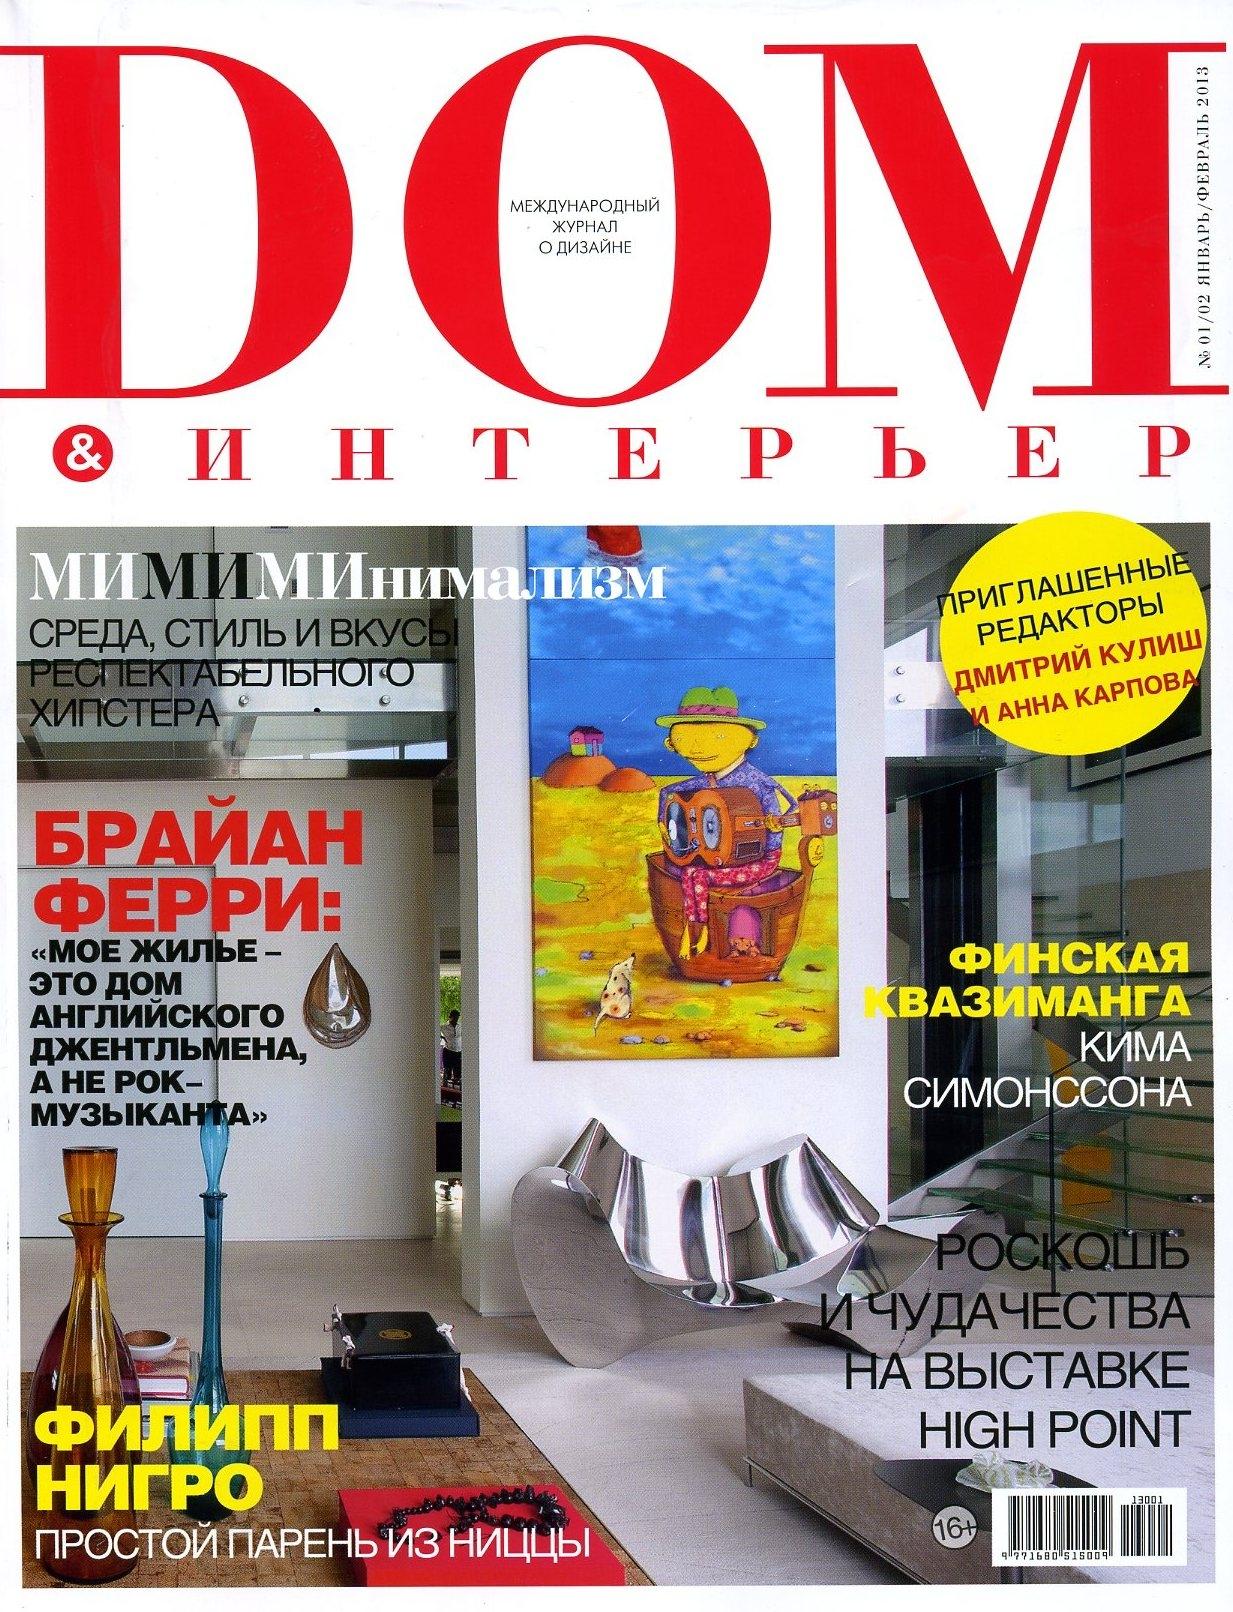 Журналы про дизайн и интерьер фото 3